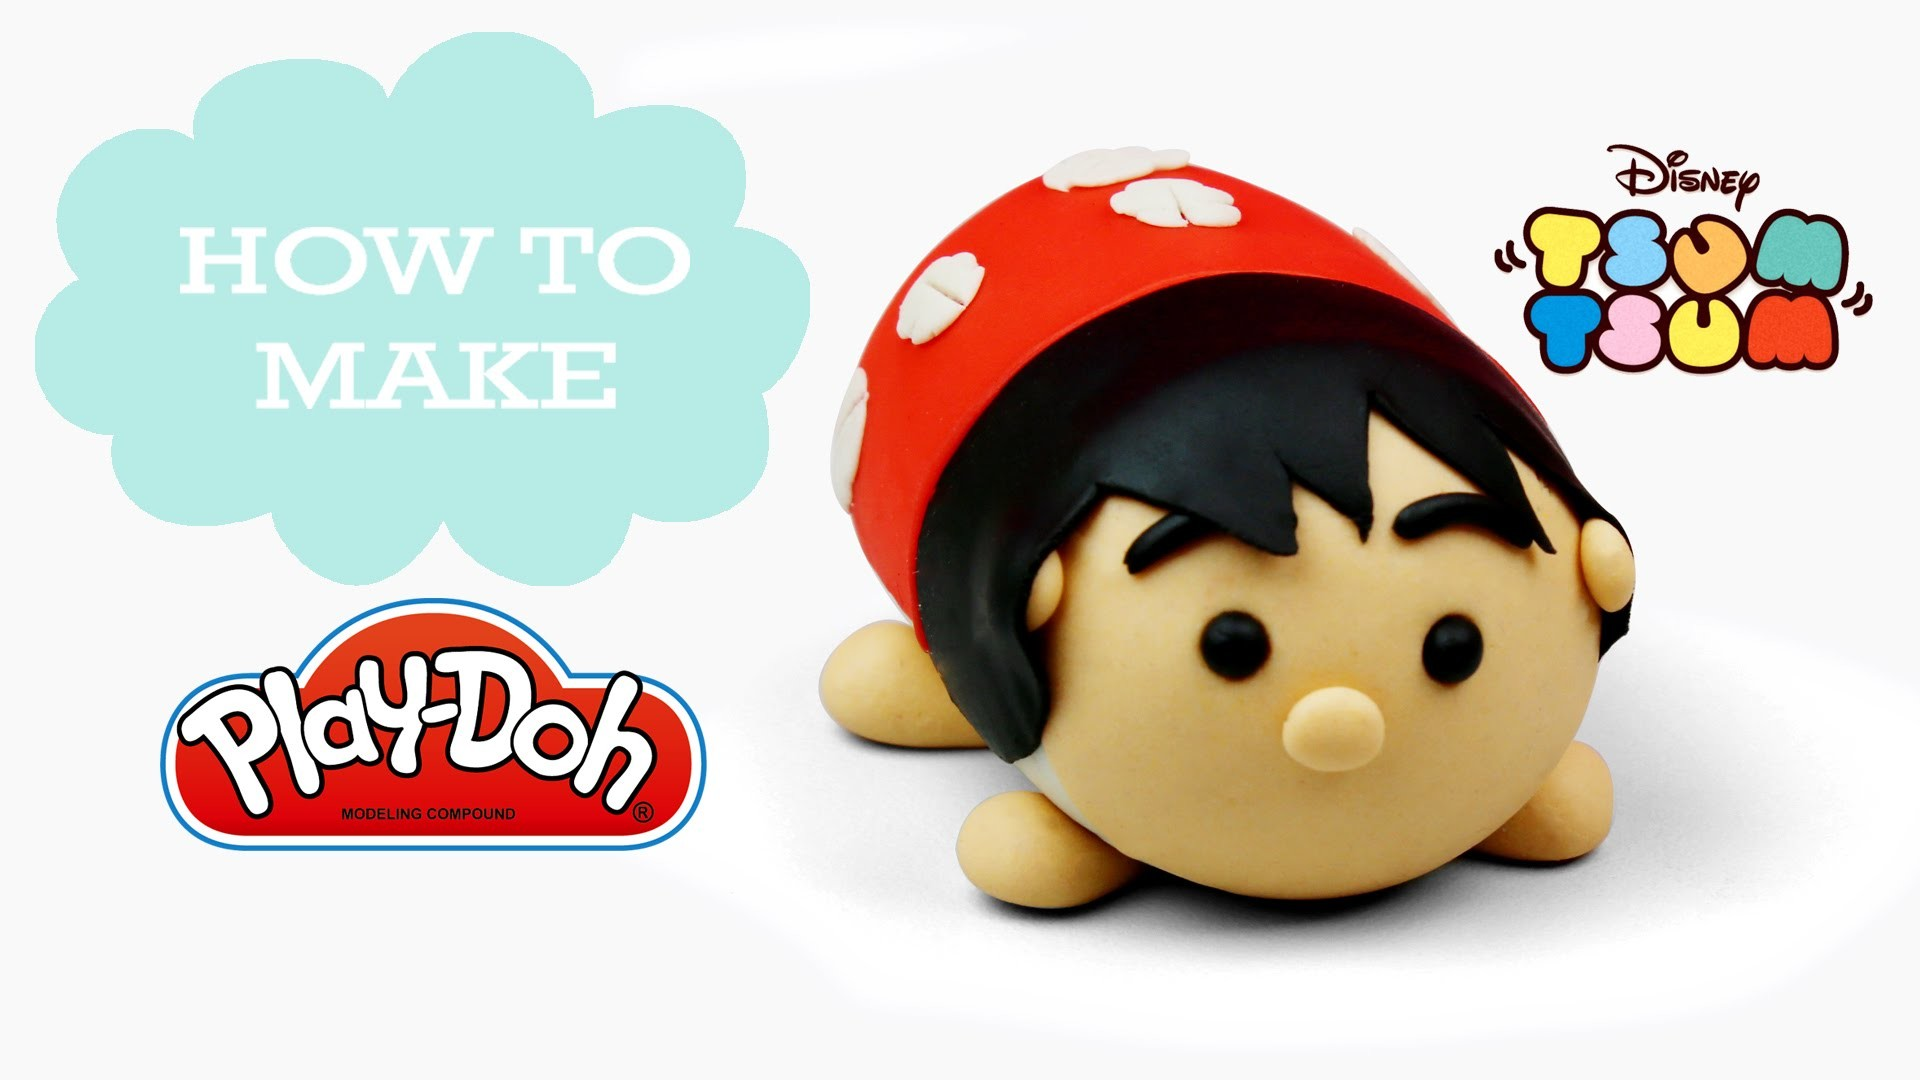 Lilo & Stitch – Play Doh Making Cute Lilo Tsum Tsum